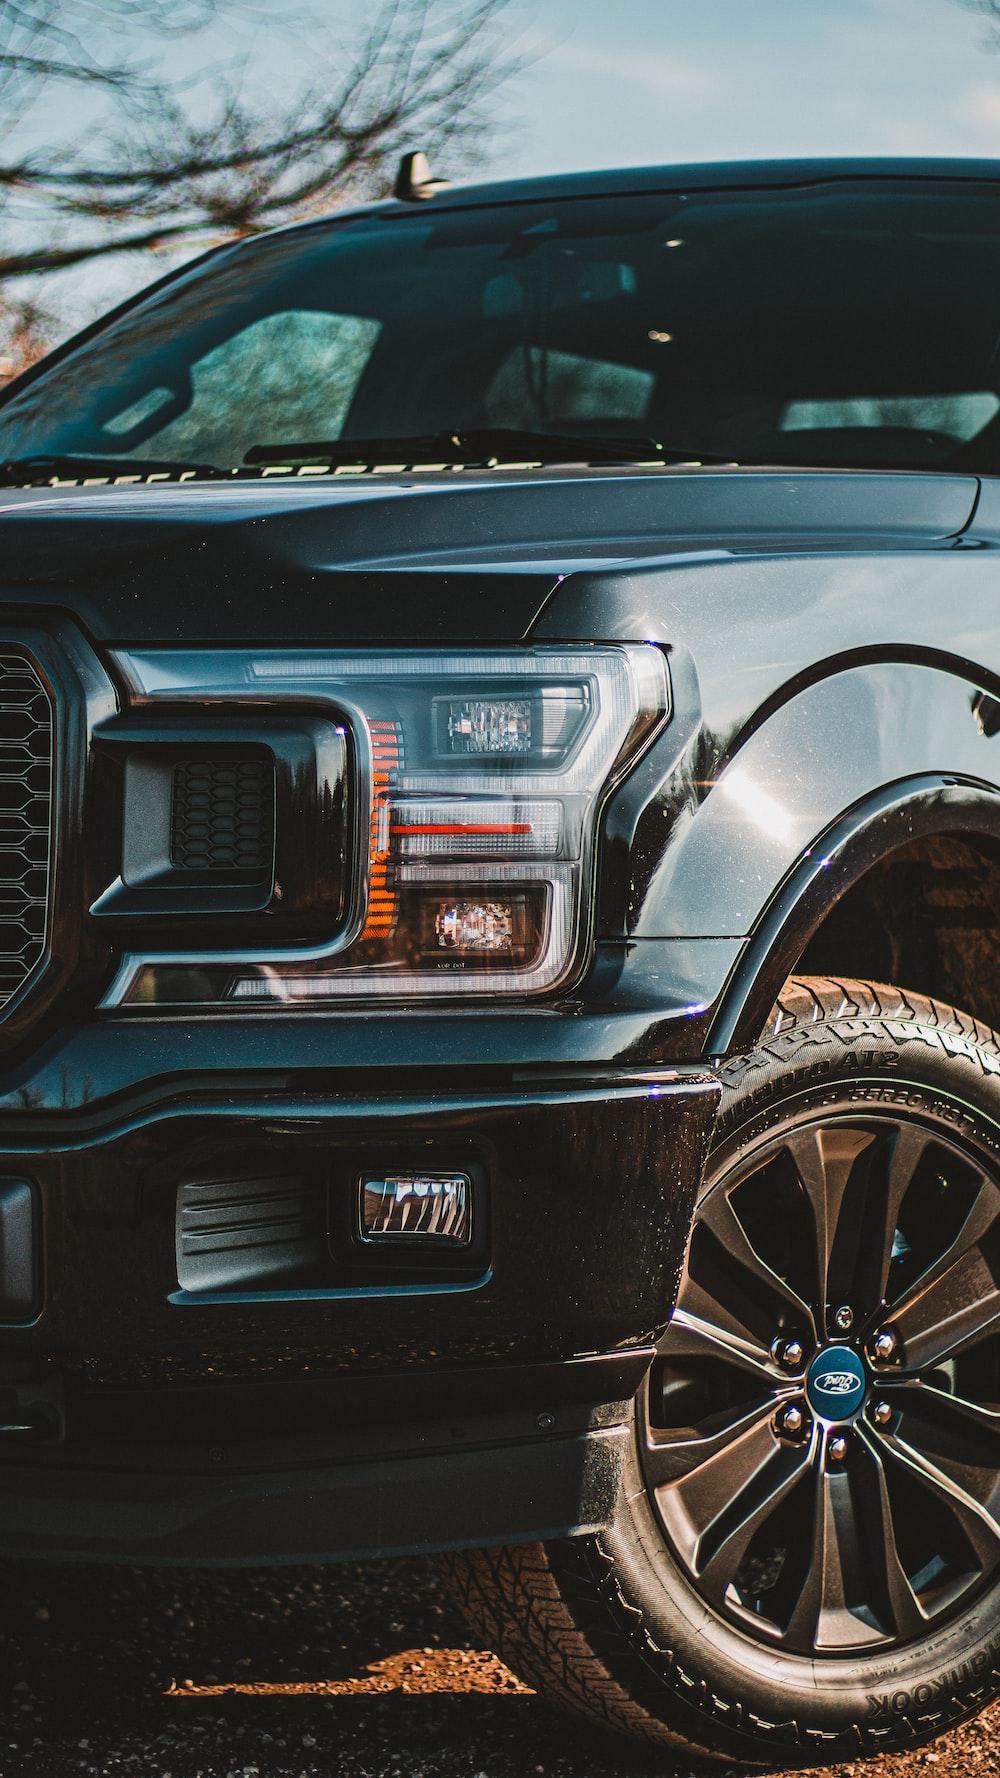 black Ford vehicle